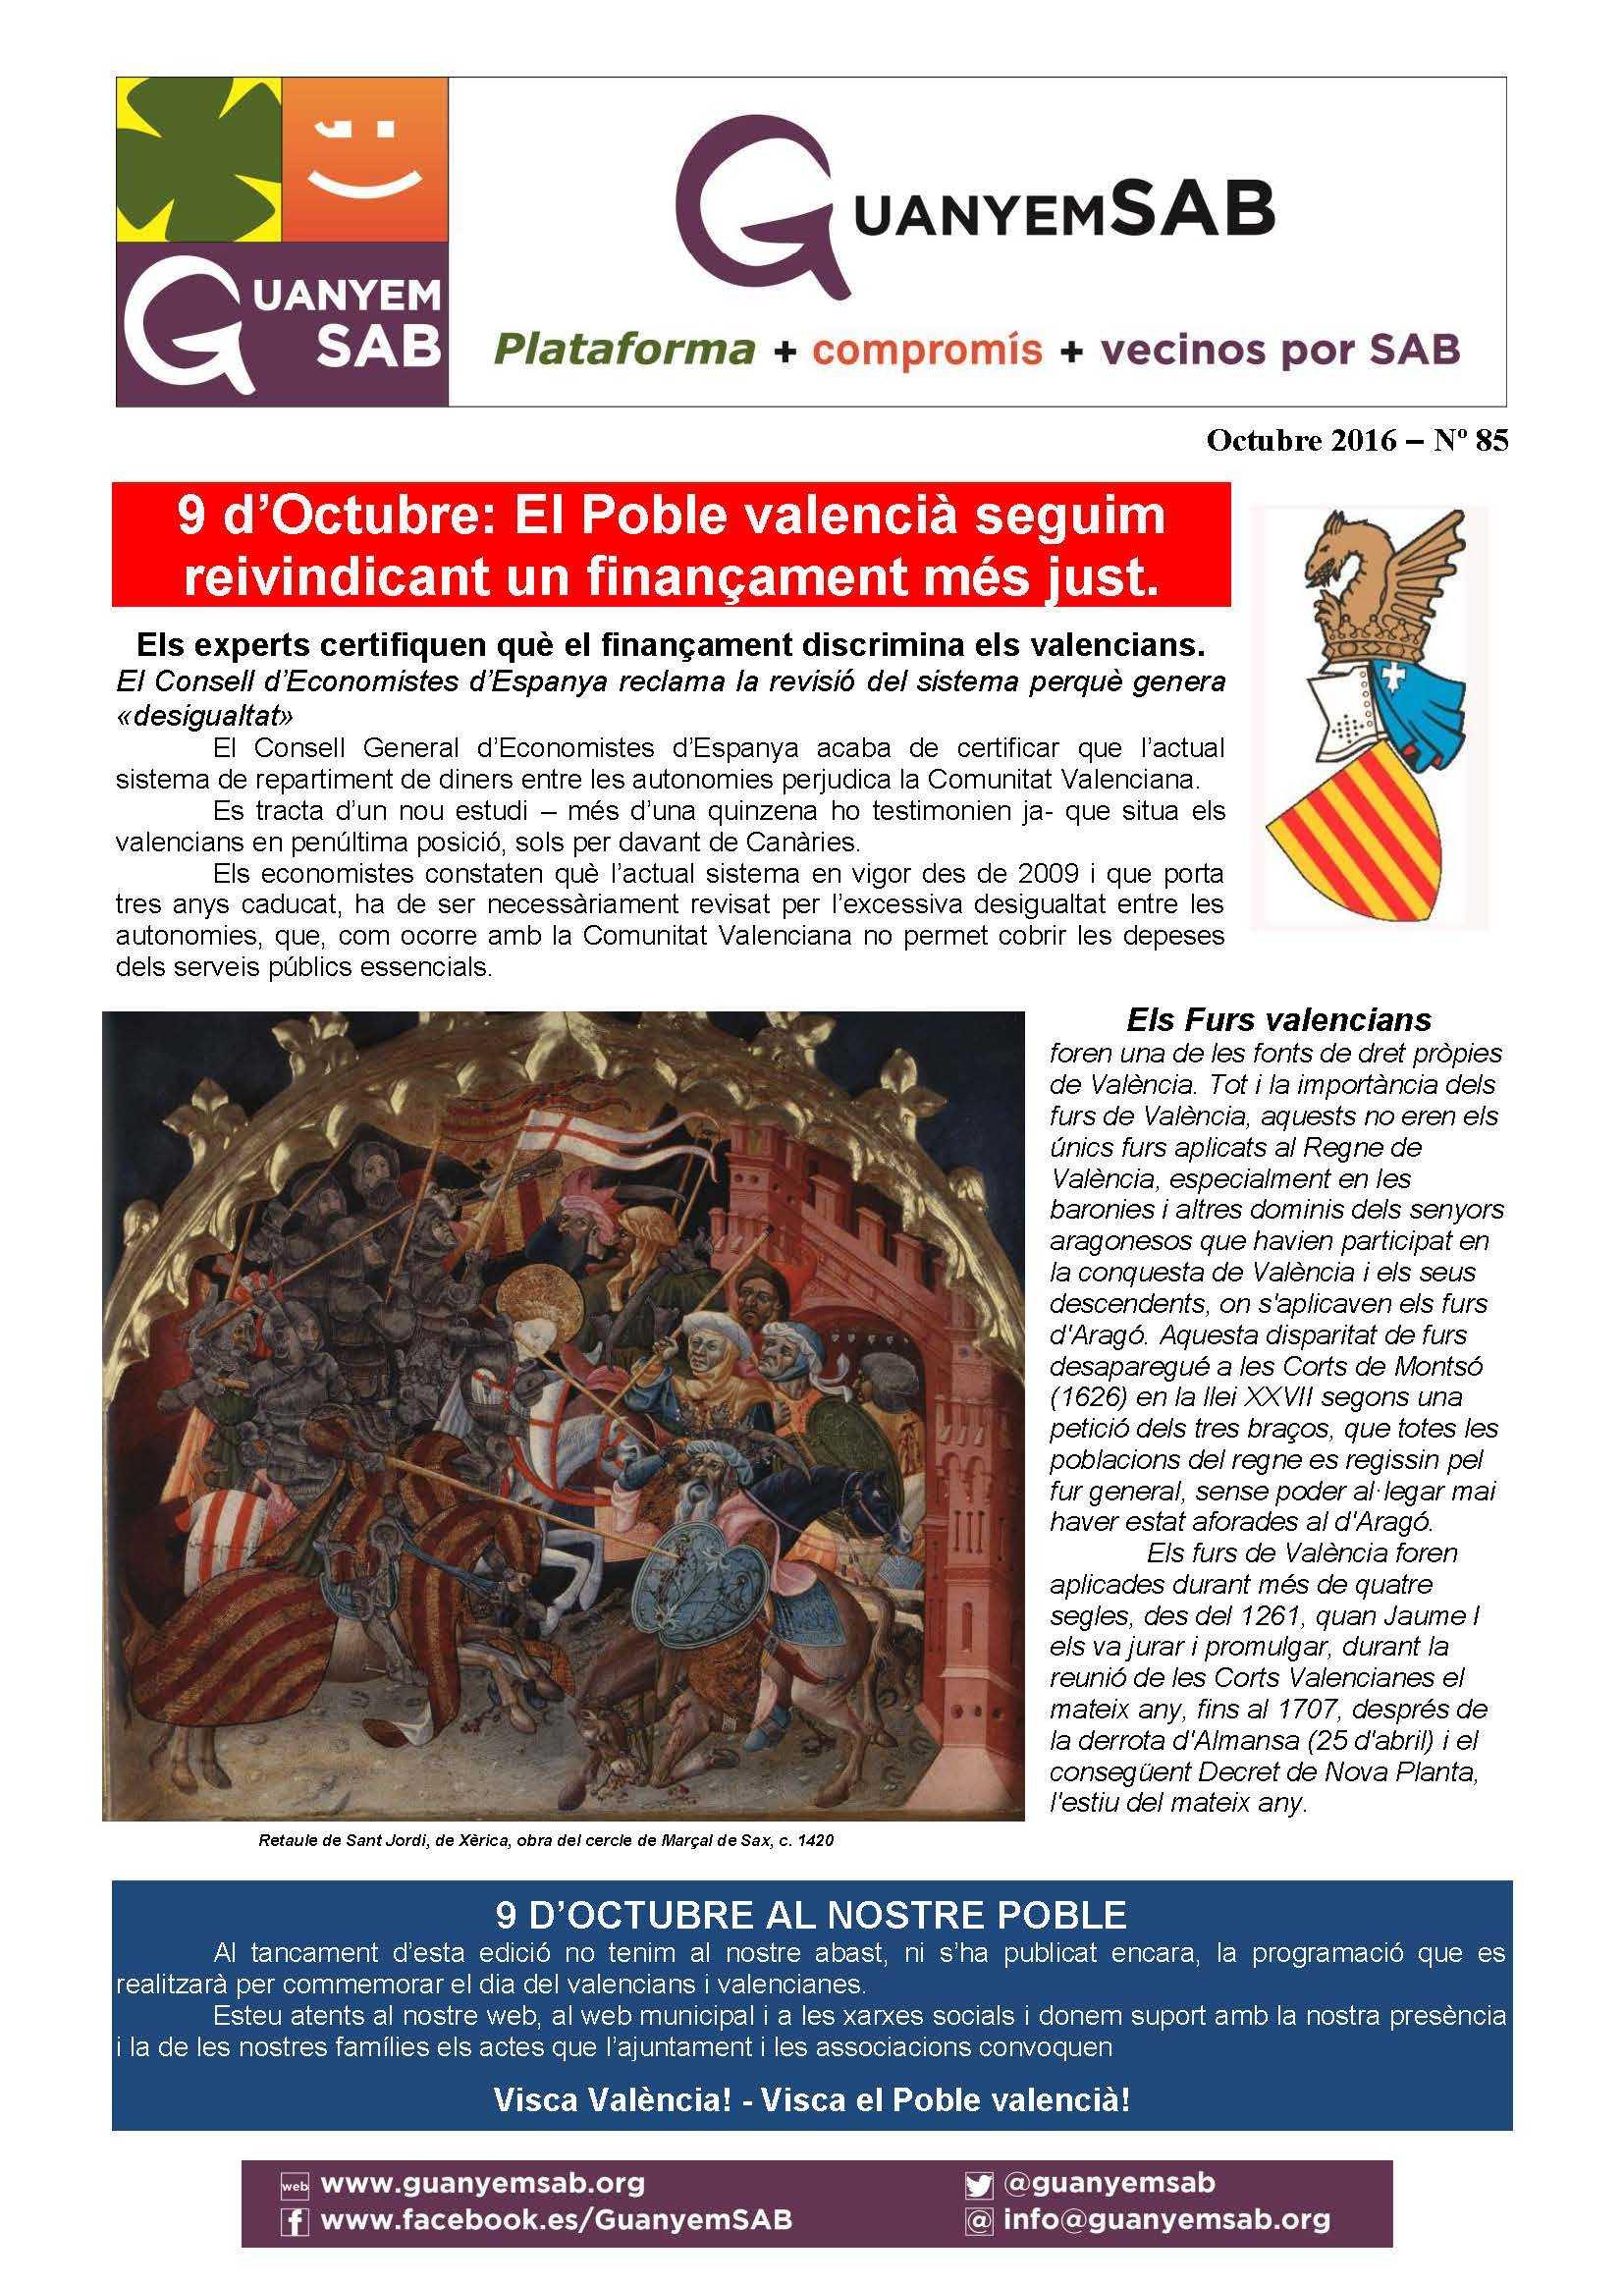 gsab_boletin_85_2016_10_09_pagina_4